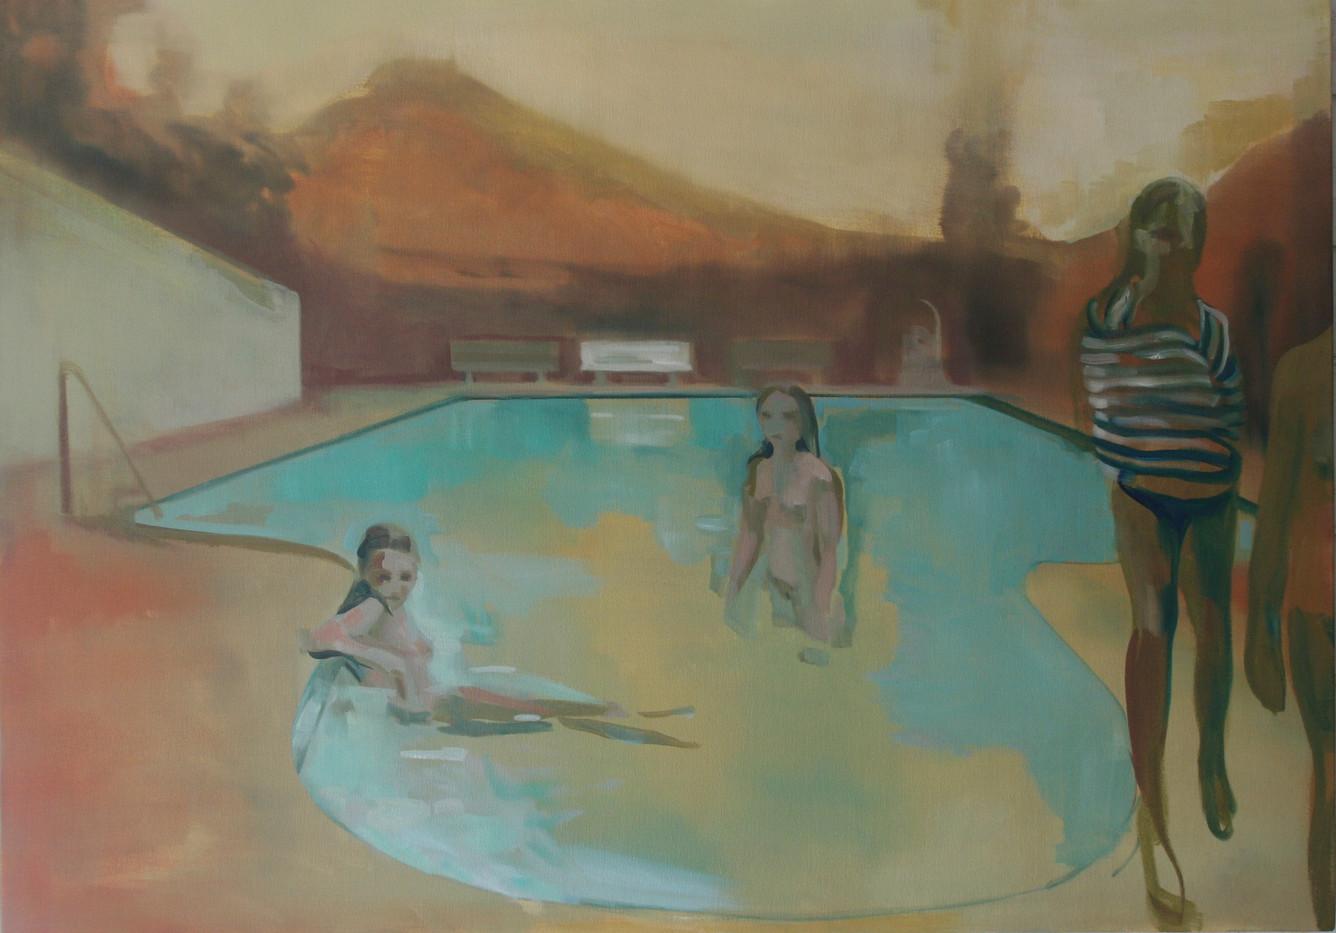 Kate Gottgens   The Gloaming   2013   Oil on Canvas   85 x 120 cm